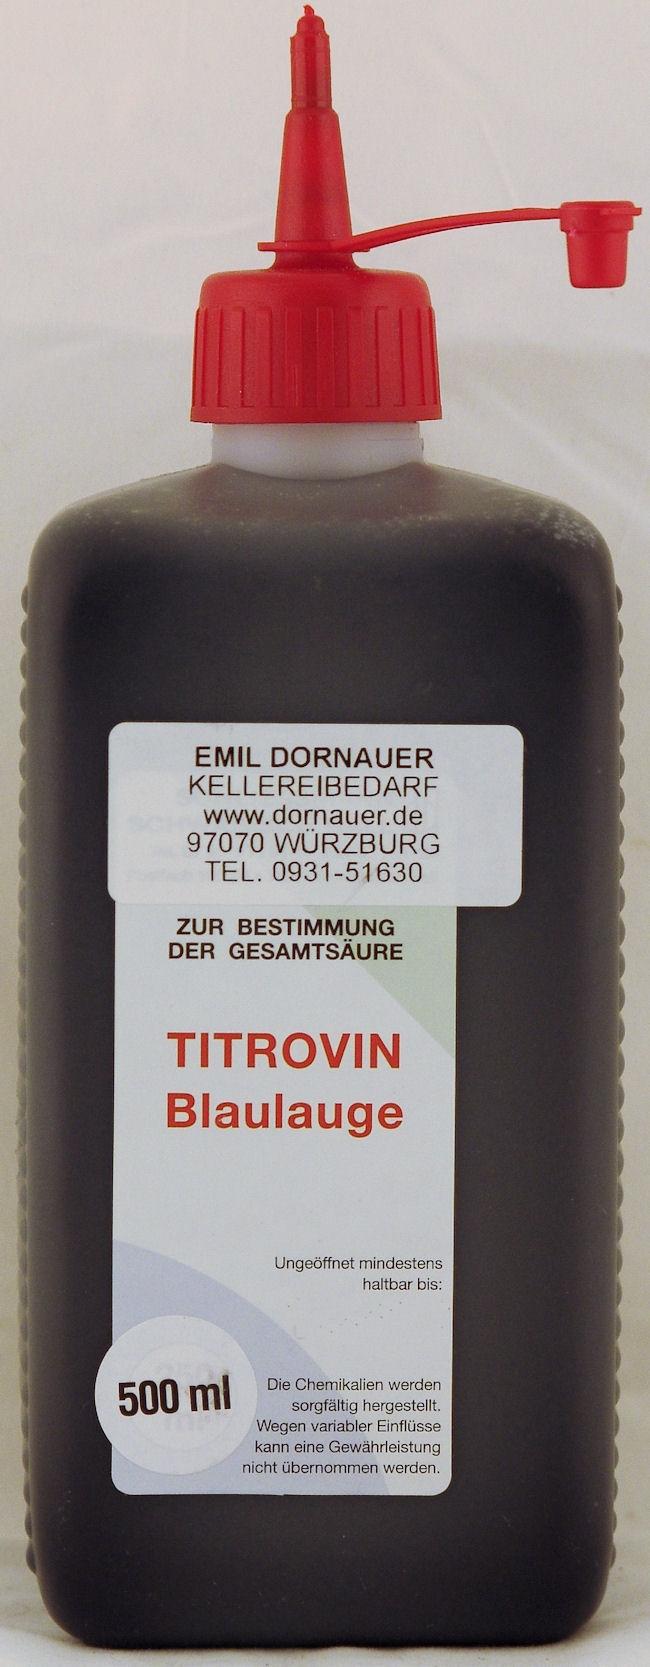 titrovin blaulauge 500 ml titrovin labor und. Black Bedroom Furniture Sets. Home Design Ideas